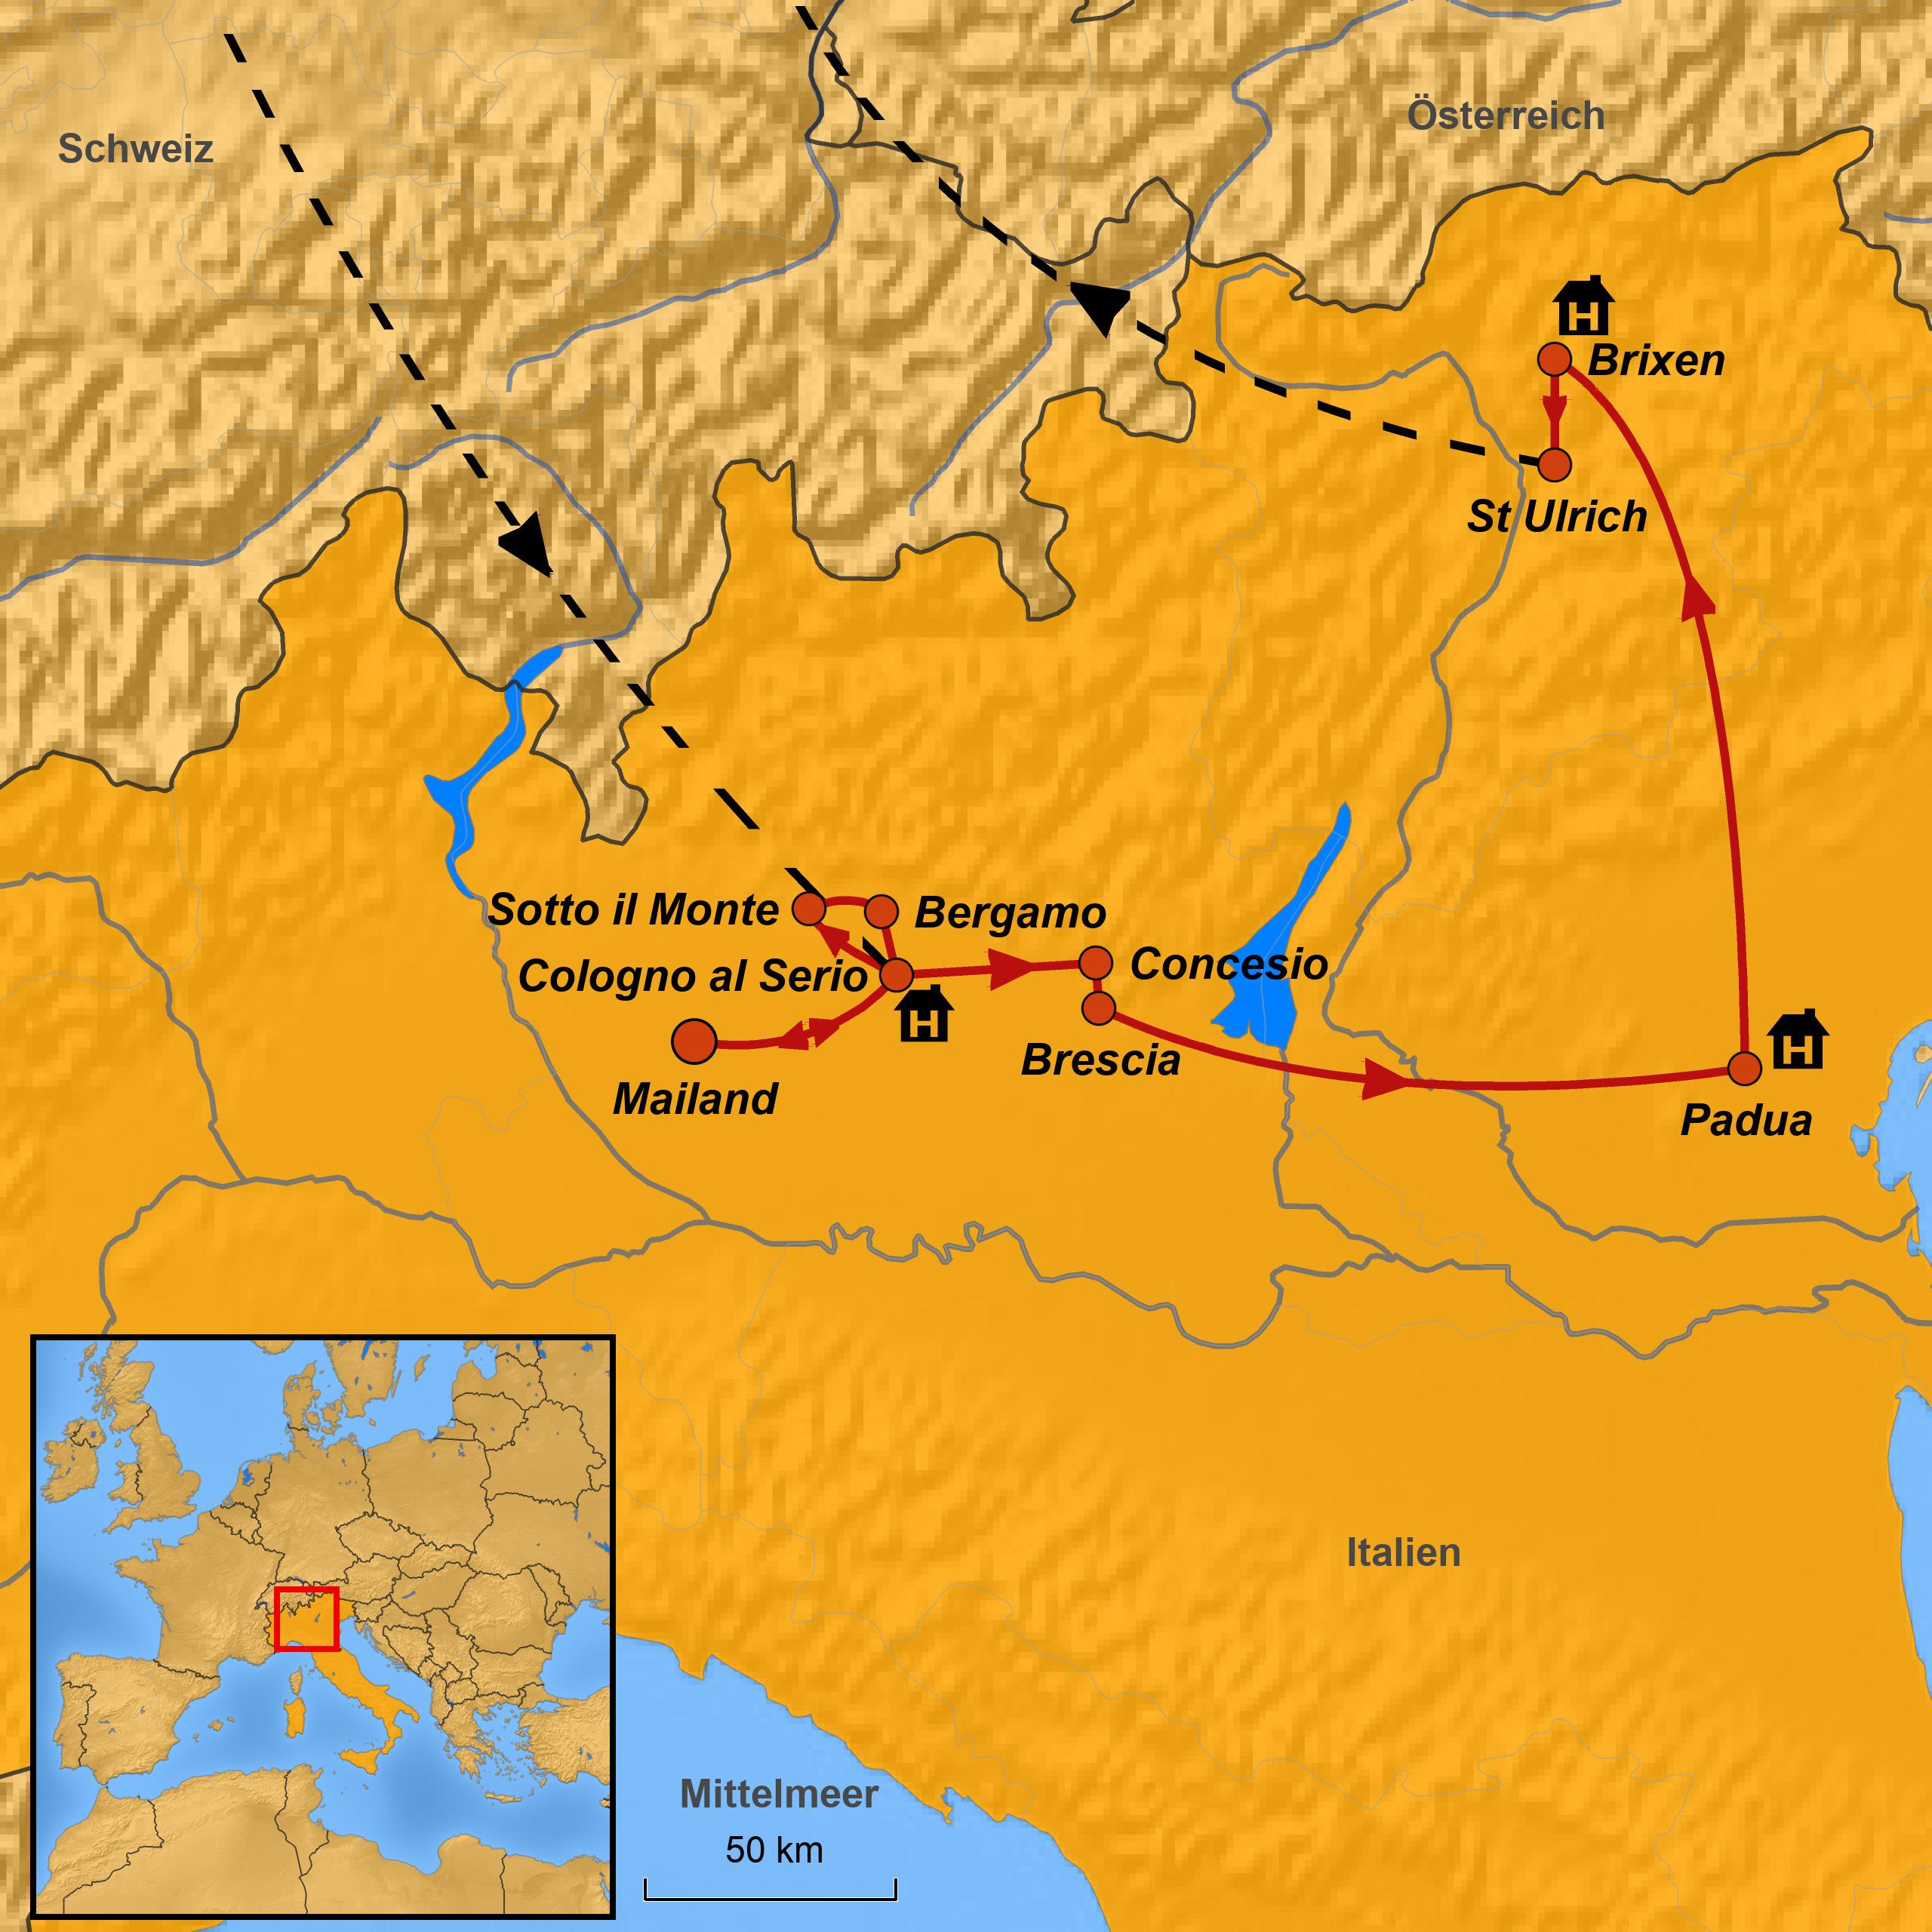 Norditalien Karte.Pilgerfahrt Norditalien Große Heilige Arche Noah Reisen